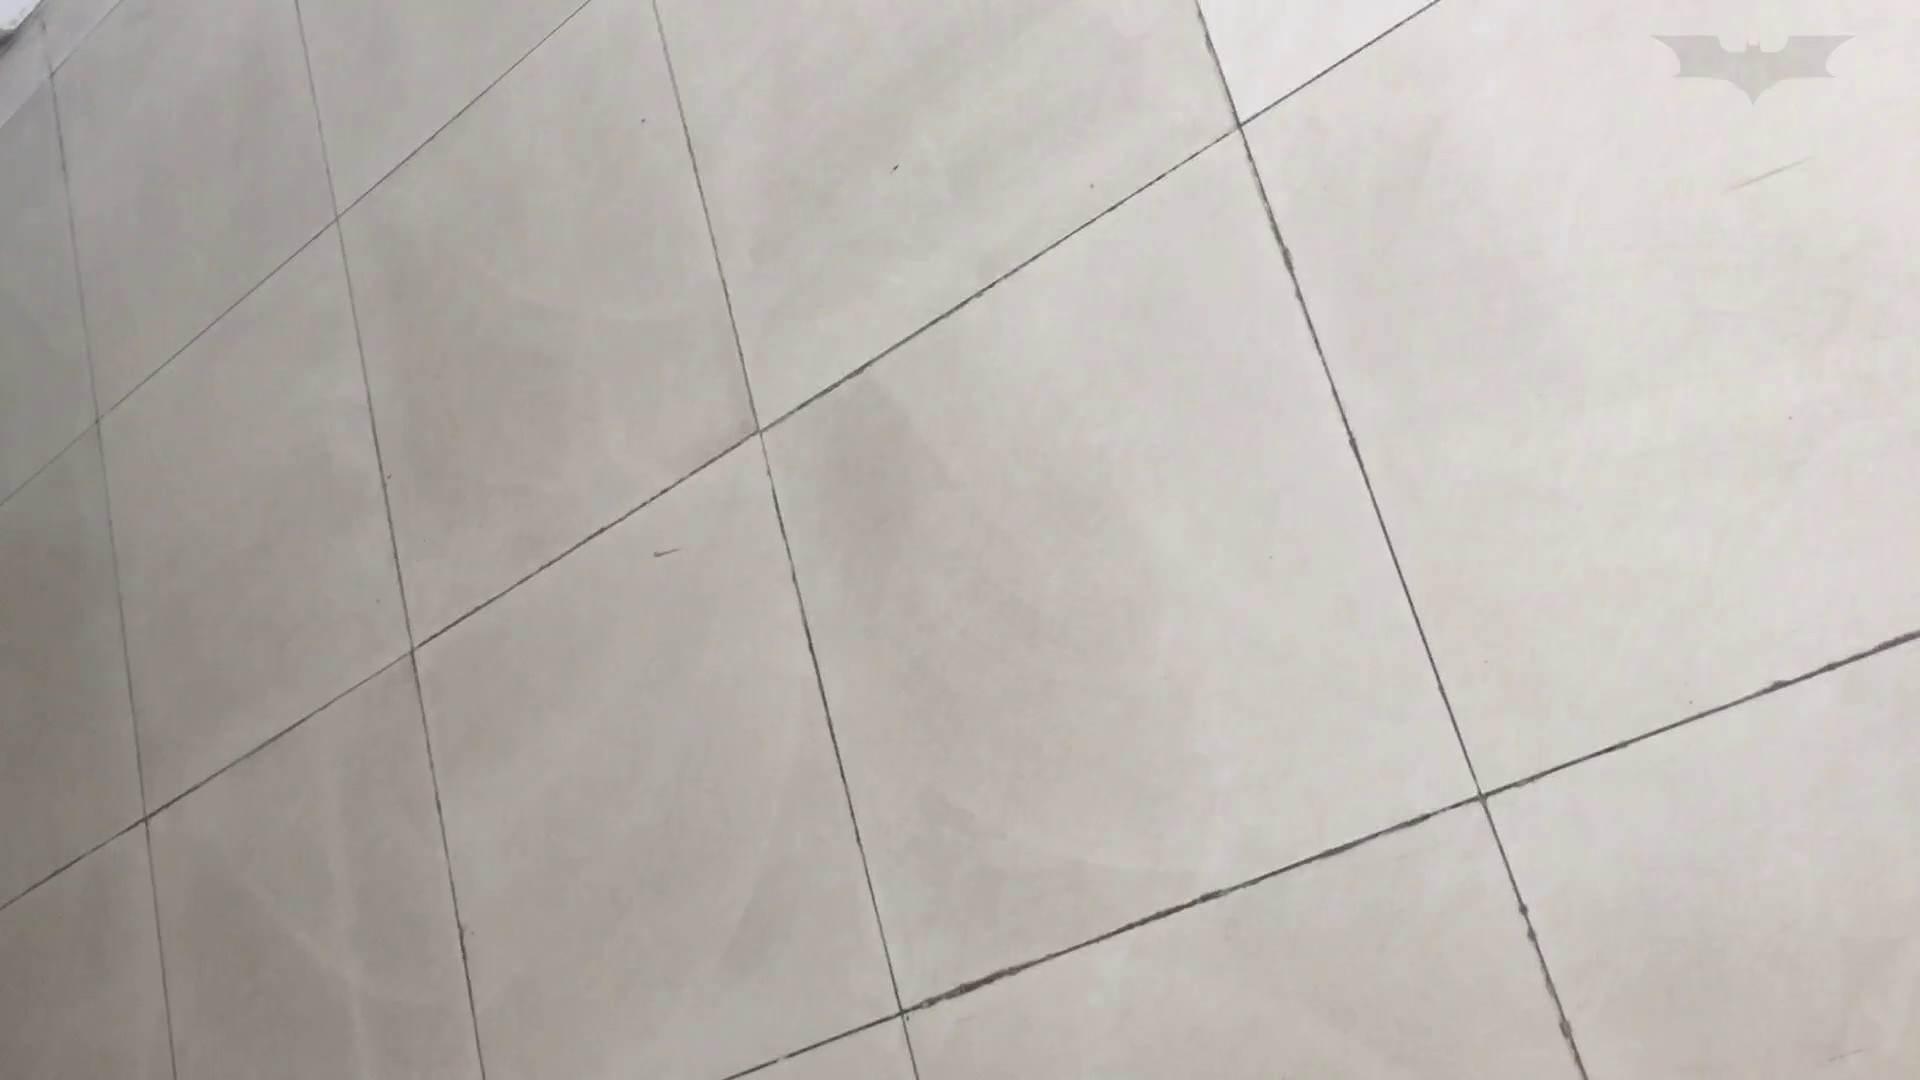 芸術大学ガチ潜入盗撮 JD盗撮 美女の洗面所の秘密 Vol.80 盛合せ  79PIX 4